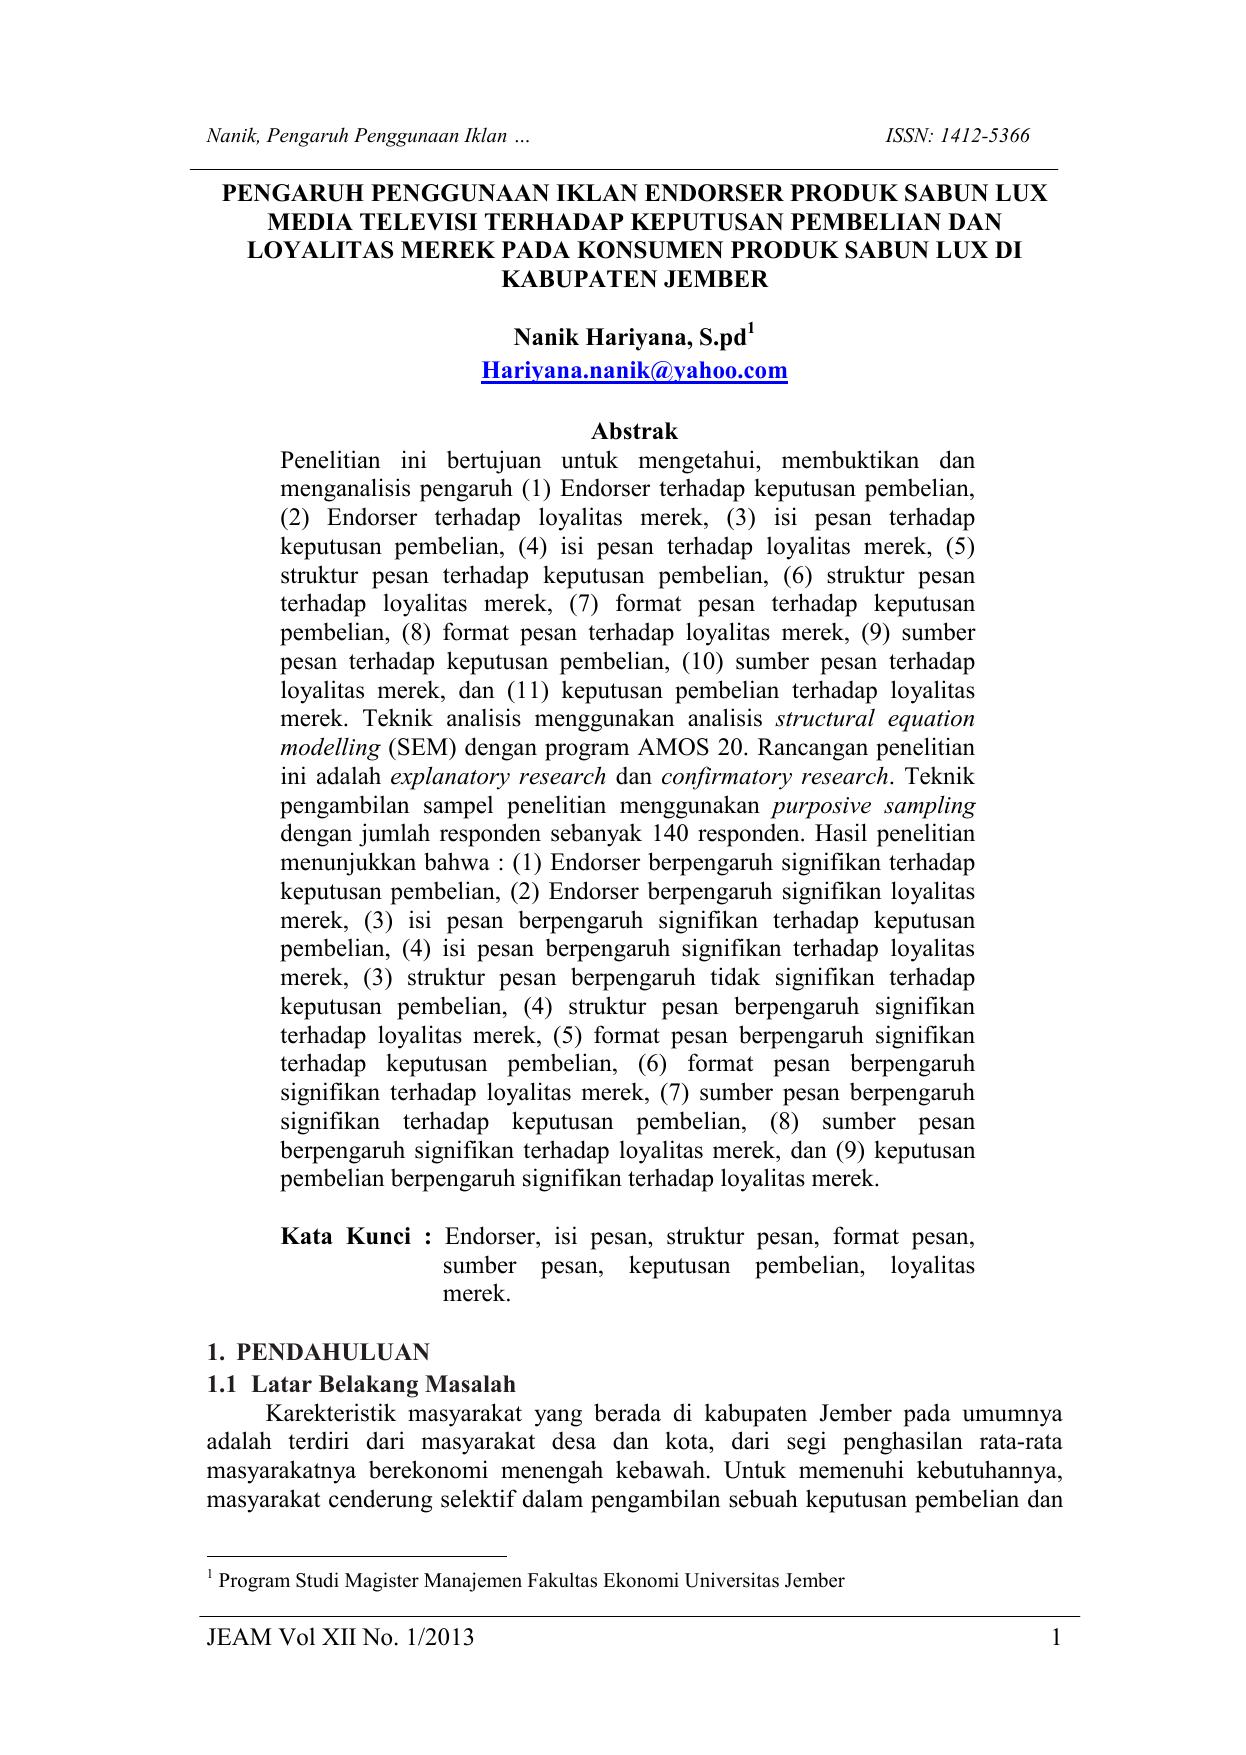 Jeam Vol Xii No 1 2013 1 Pengaruh Penggunaan Iklan